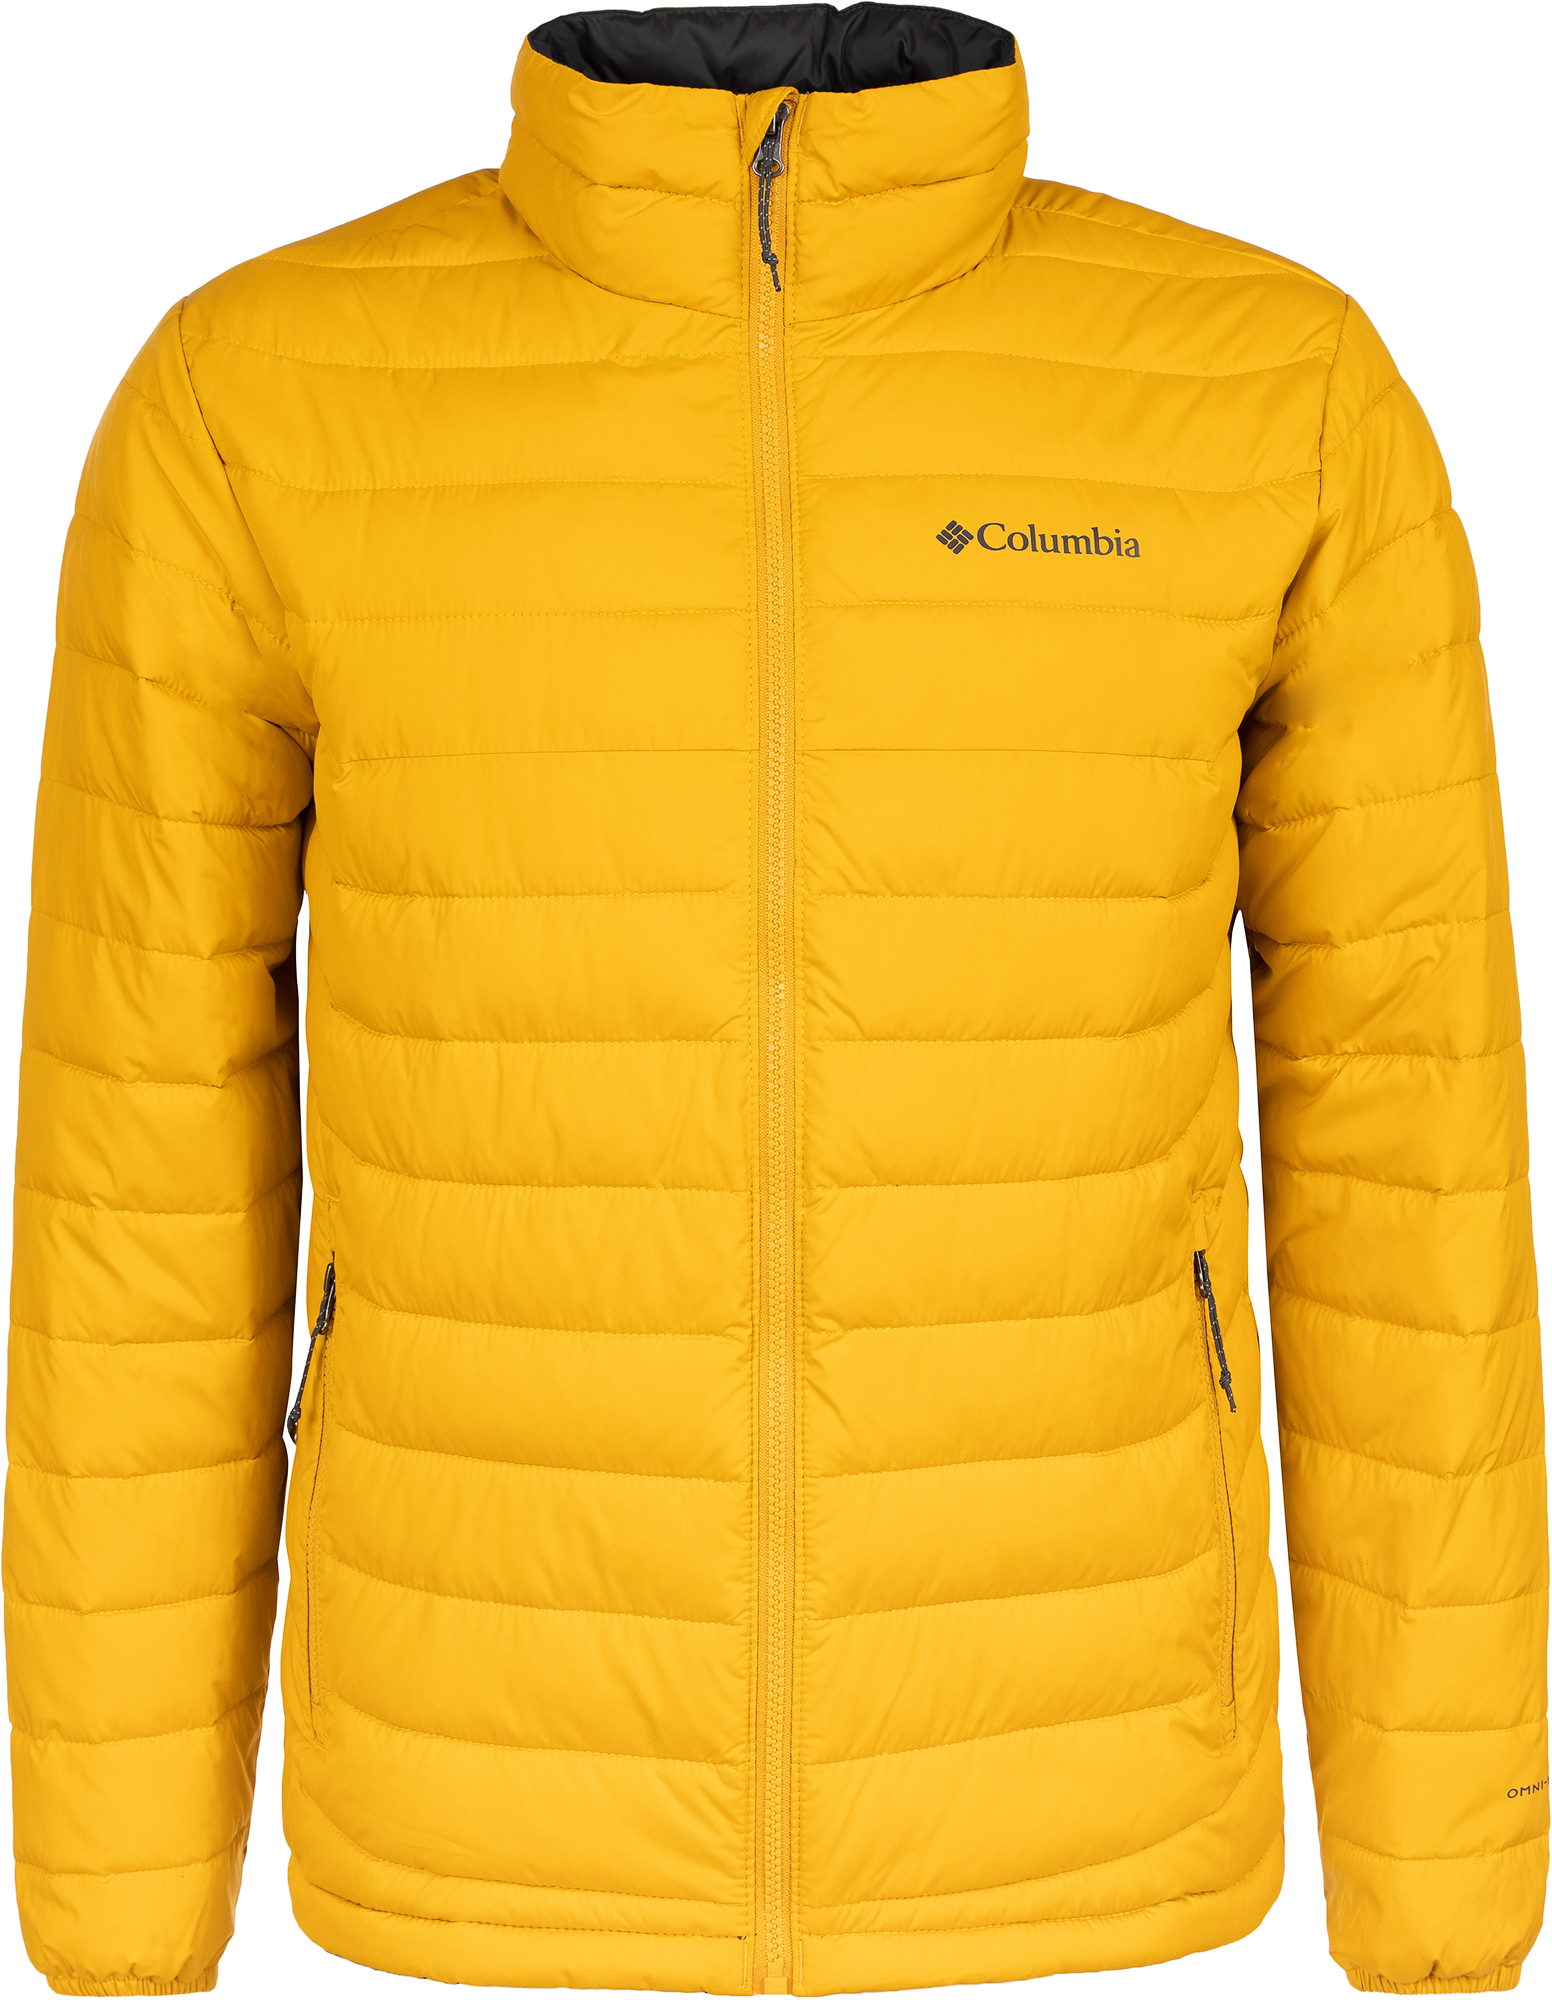 Columbia Куртка утепленная мужская Columbia Powder Lite™, размер 56